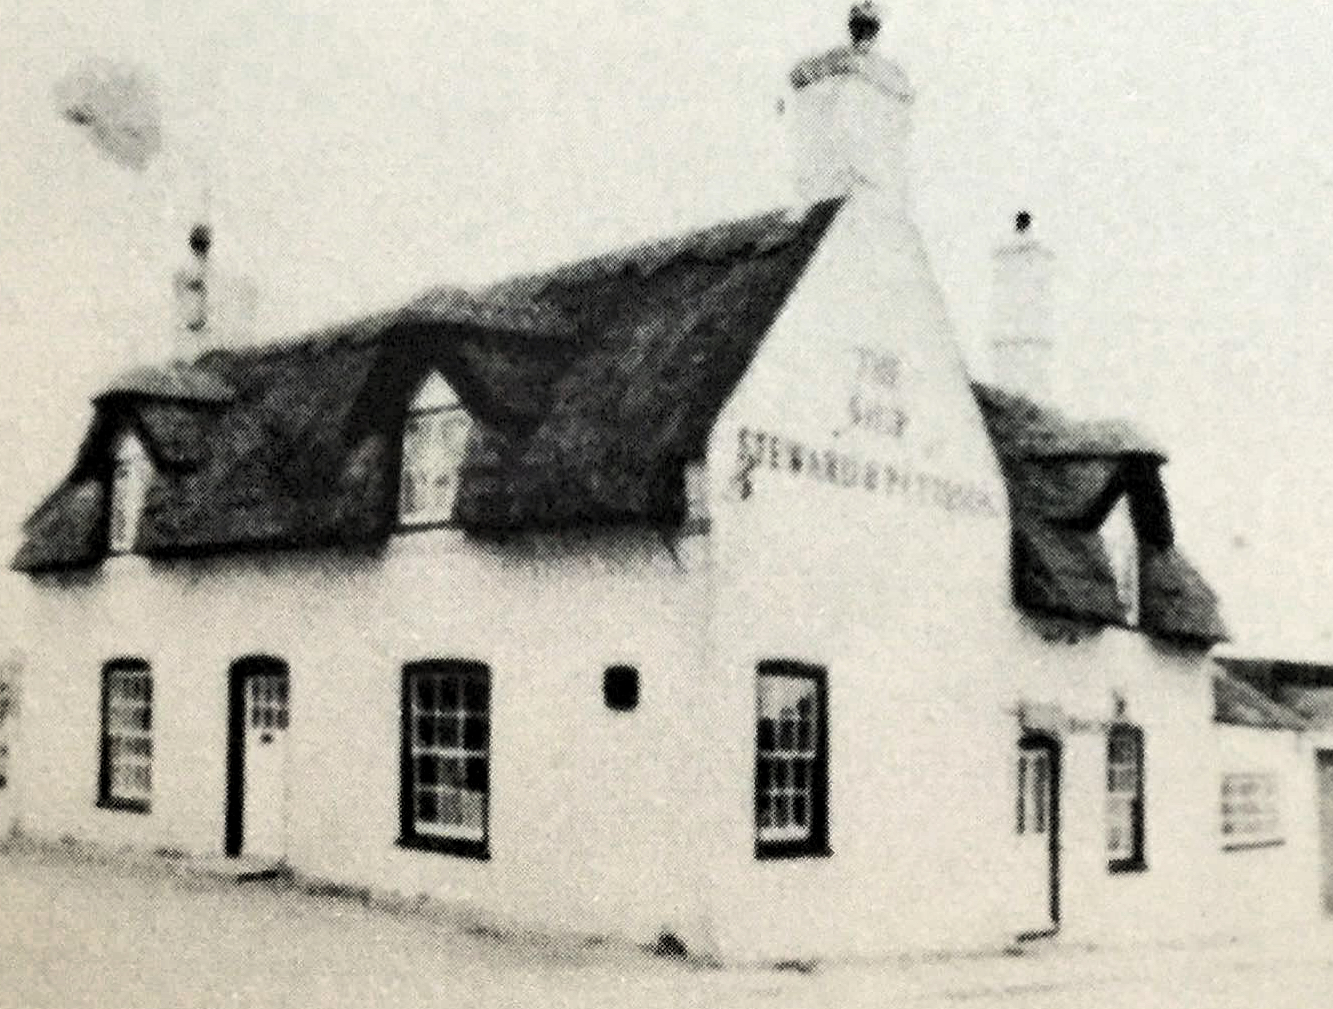 Photos of the Ship Inn Pinchbeck through time